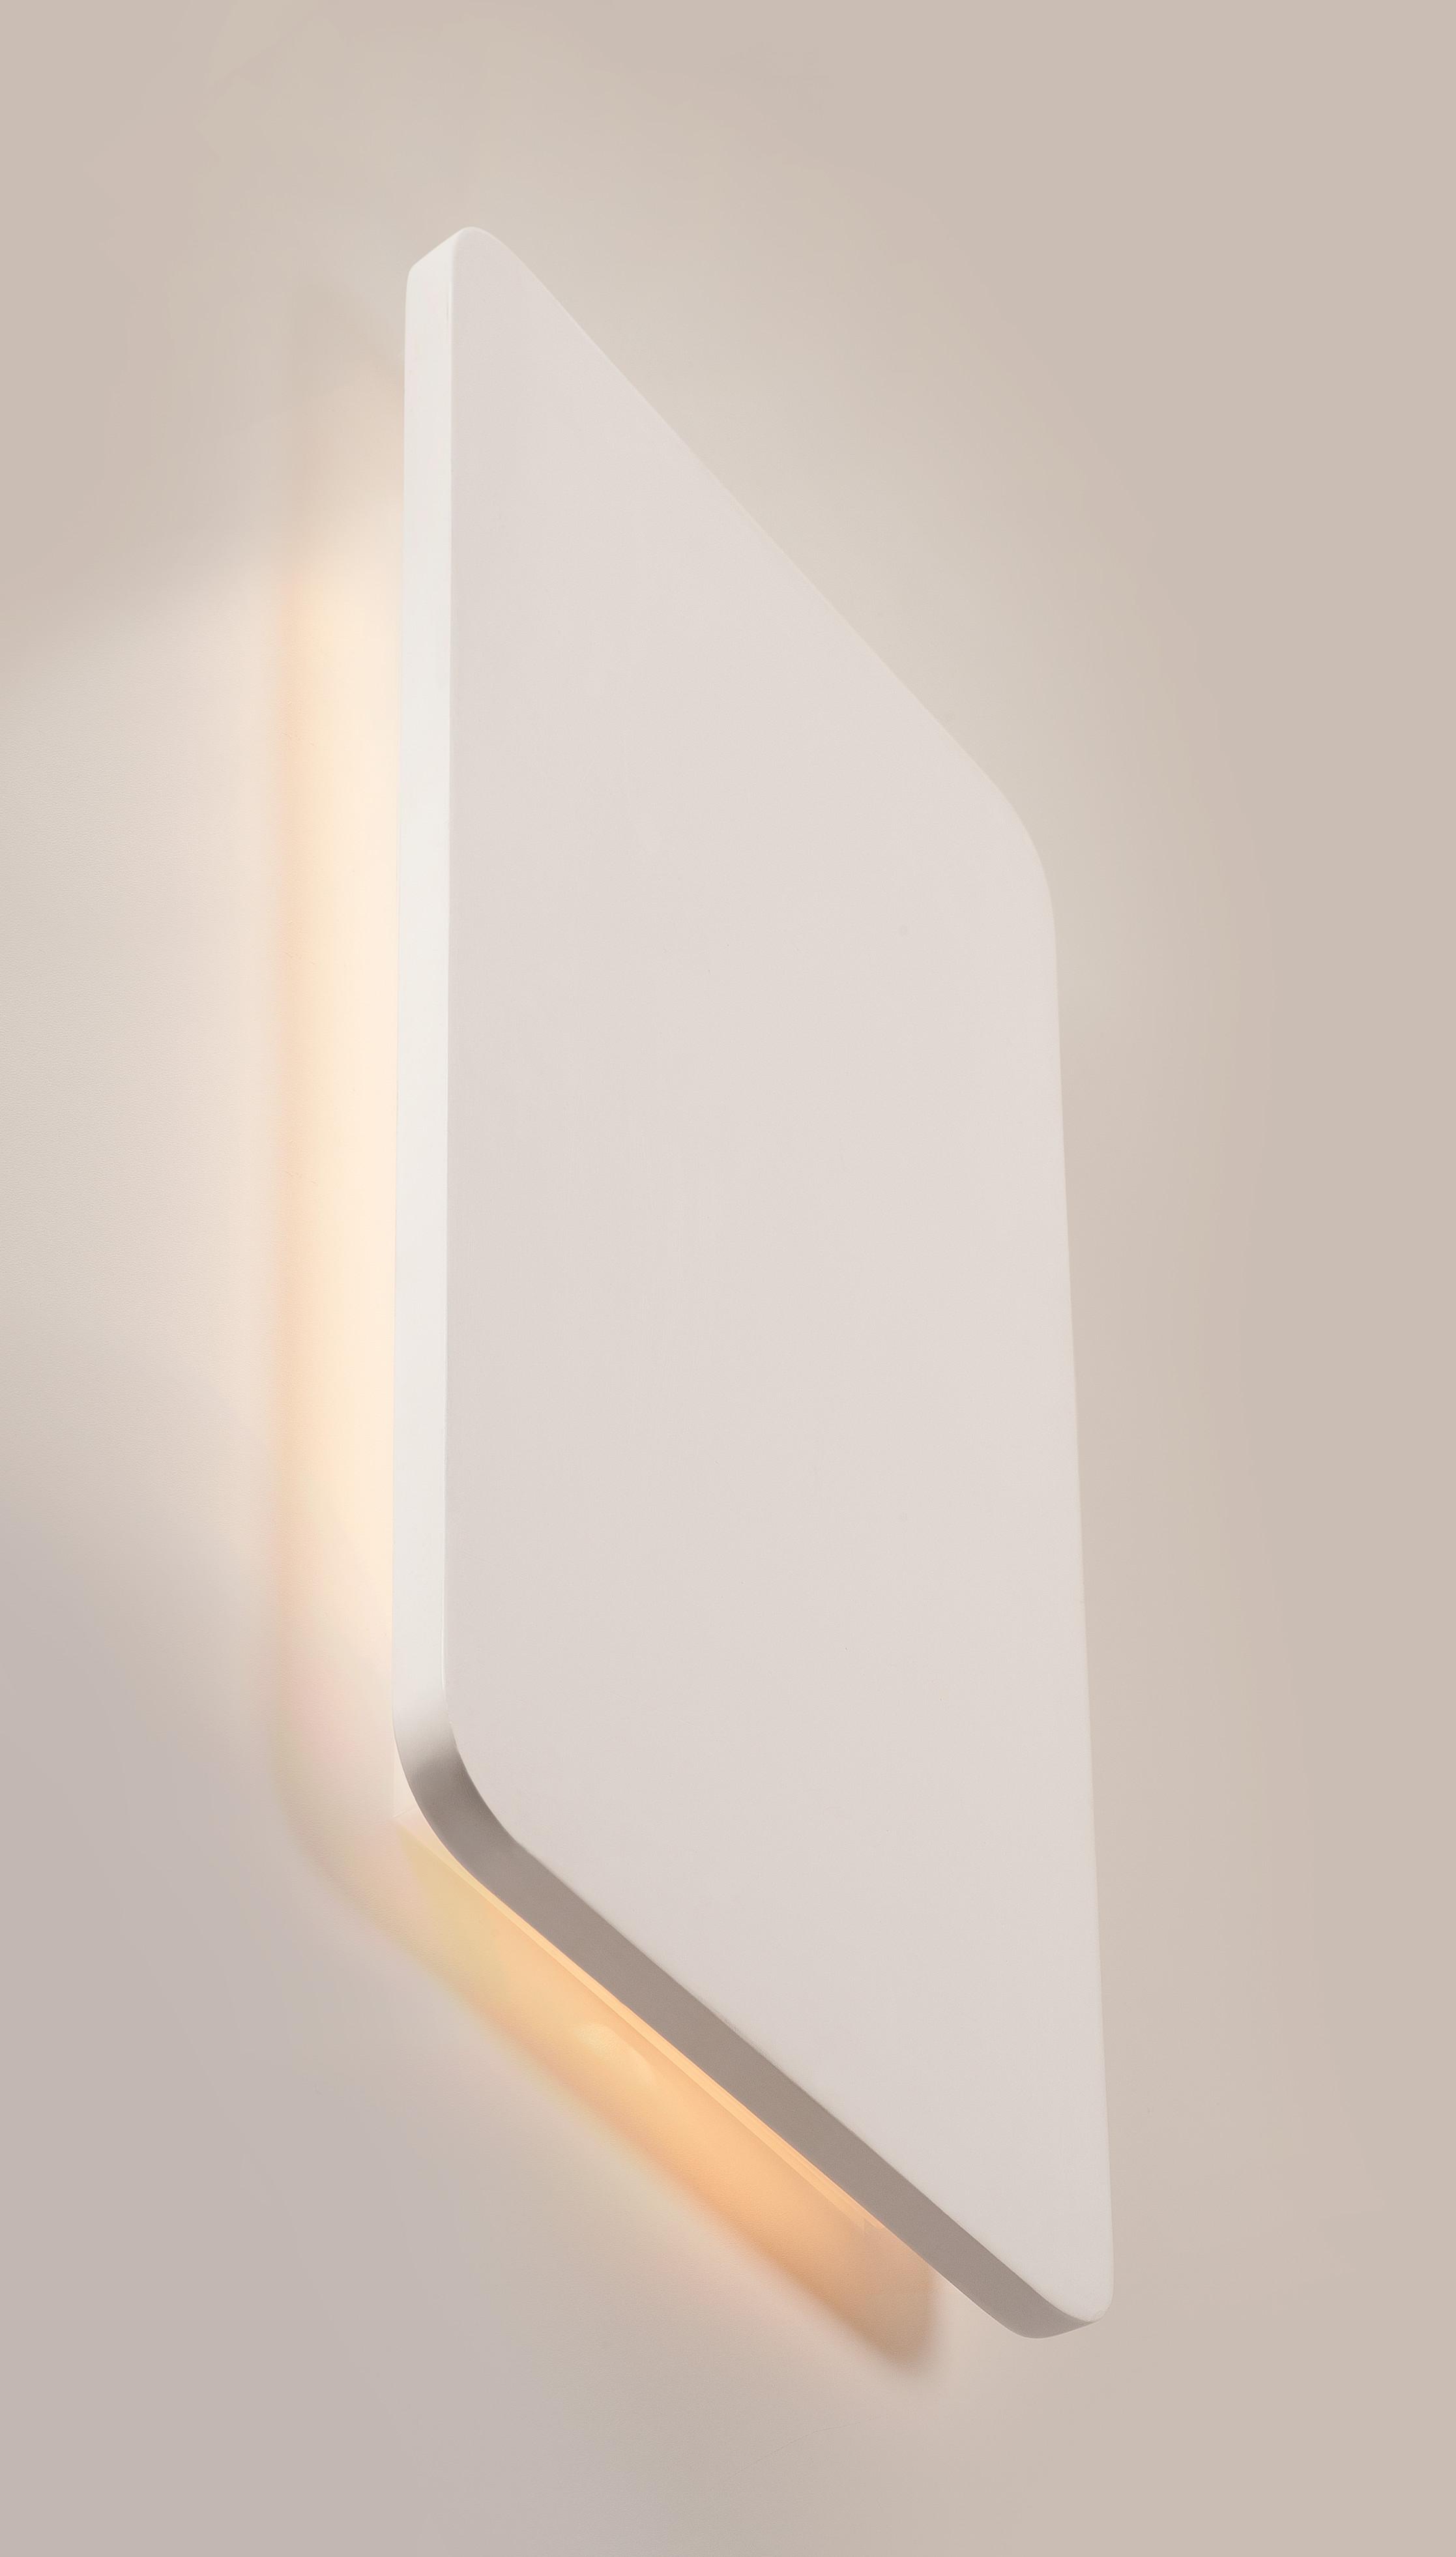 1 Stk PLASTRA, Wandleuchte, LED, 3000K, rechteckig, weißer Gips LI148093--